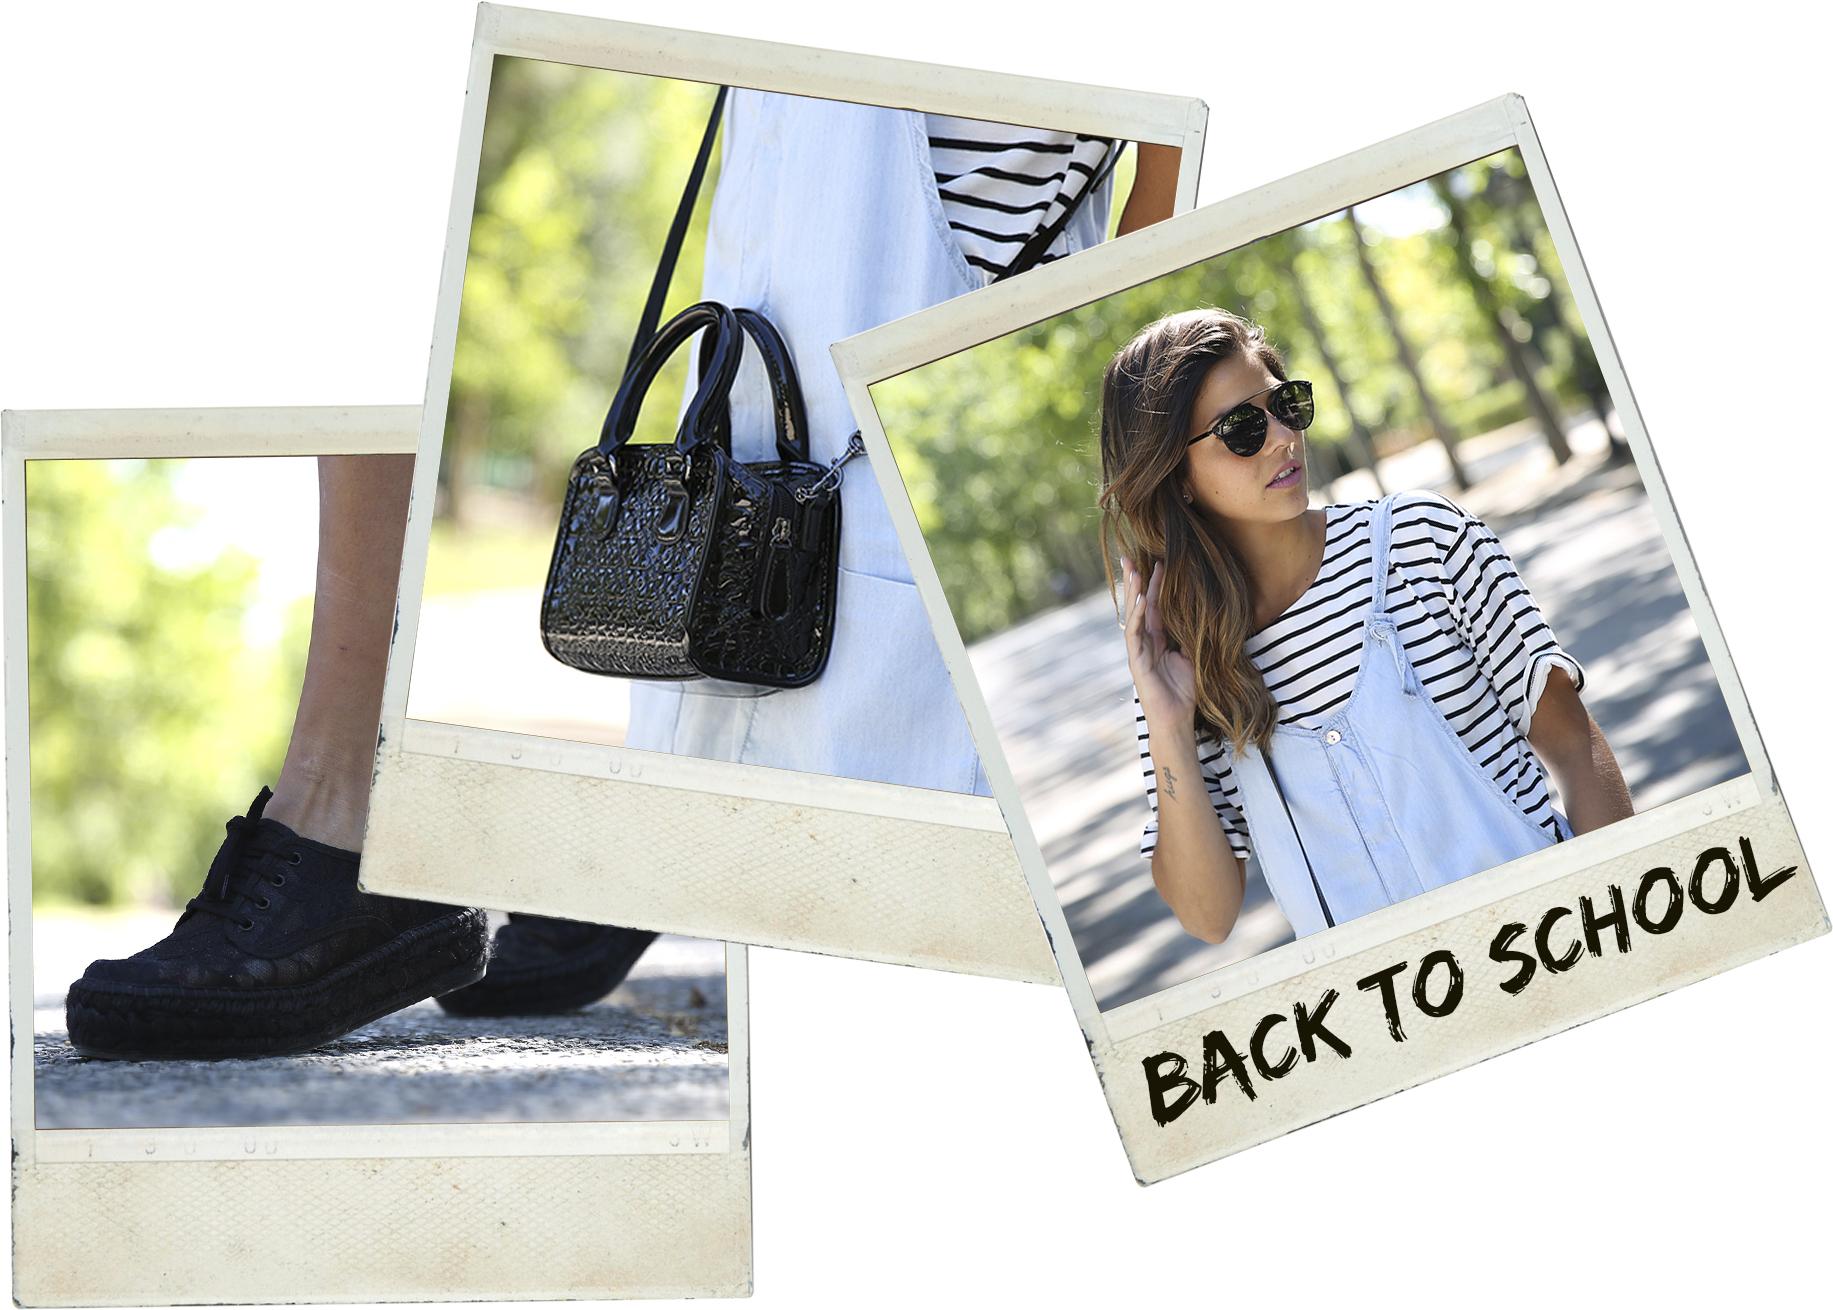 trendy_taste-look-outfit-street_style-ootd-blog-blogger-fashion_spain-vaquero_claro-peto_vaquero-tirantes-striped_tee-camiseta_rayas-marinero-dior_sunnies-gaimo-polaroid